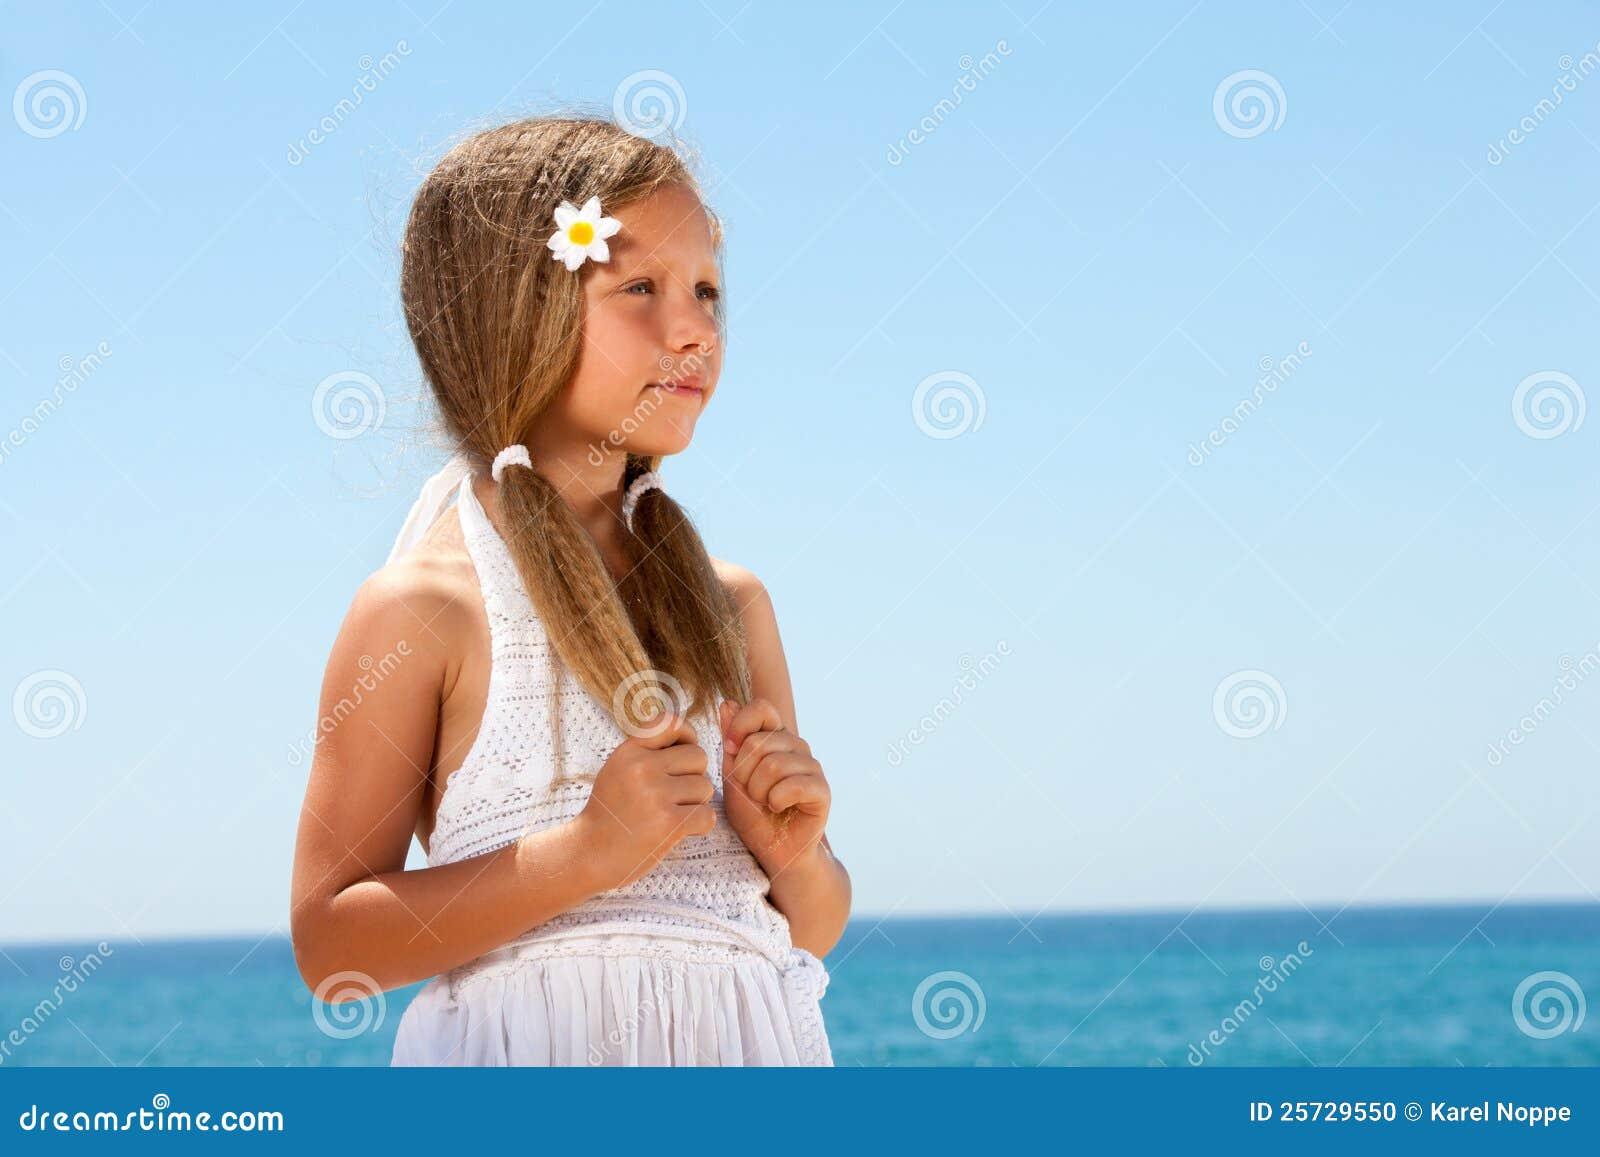 Cute girl on beach staring.